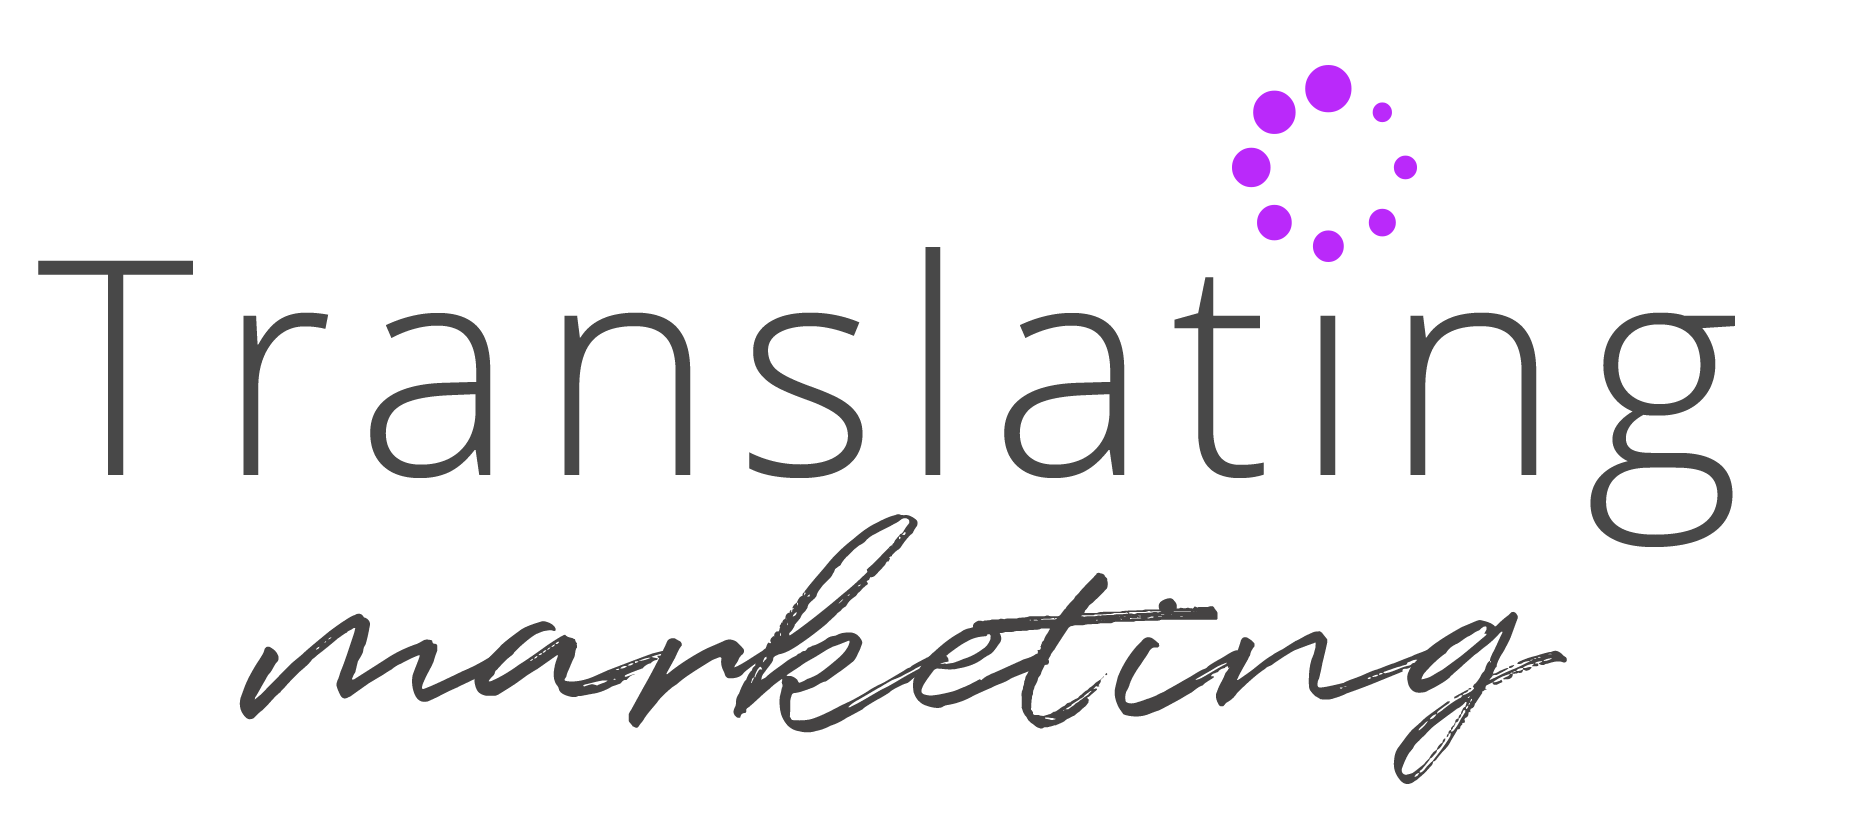 Translating marketing